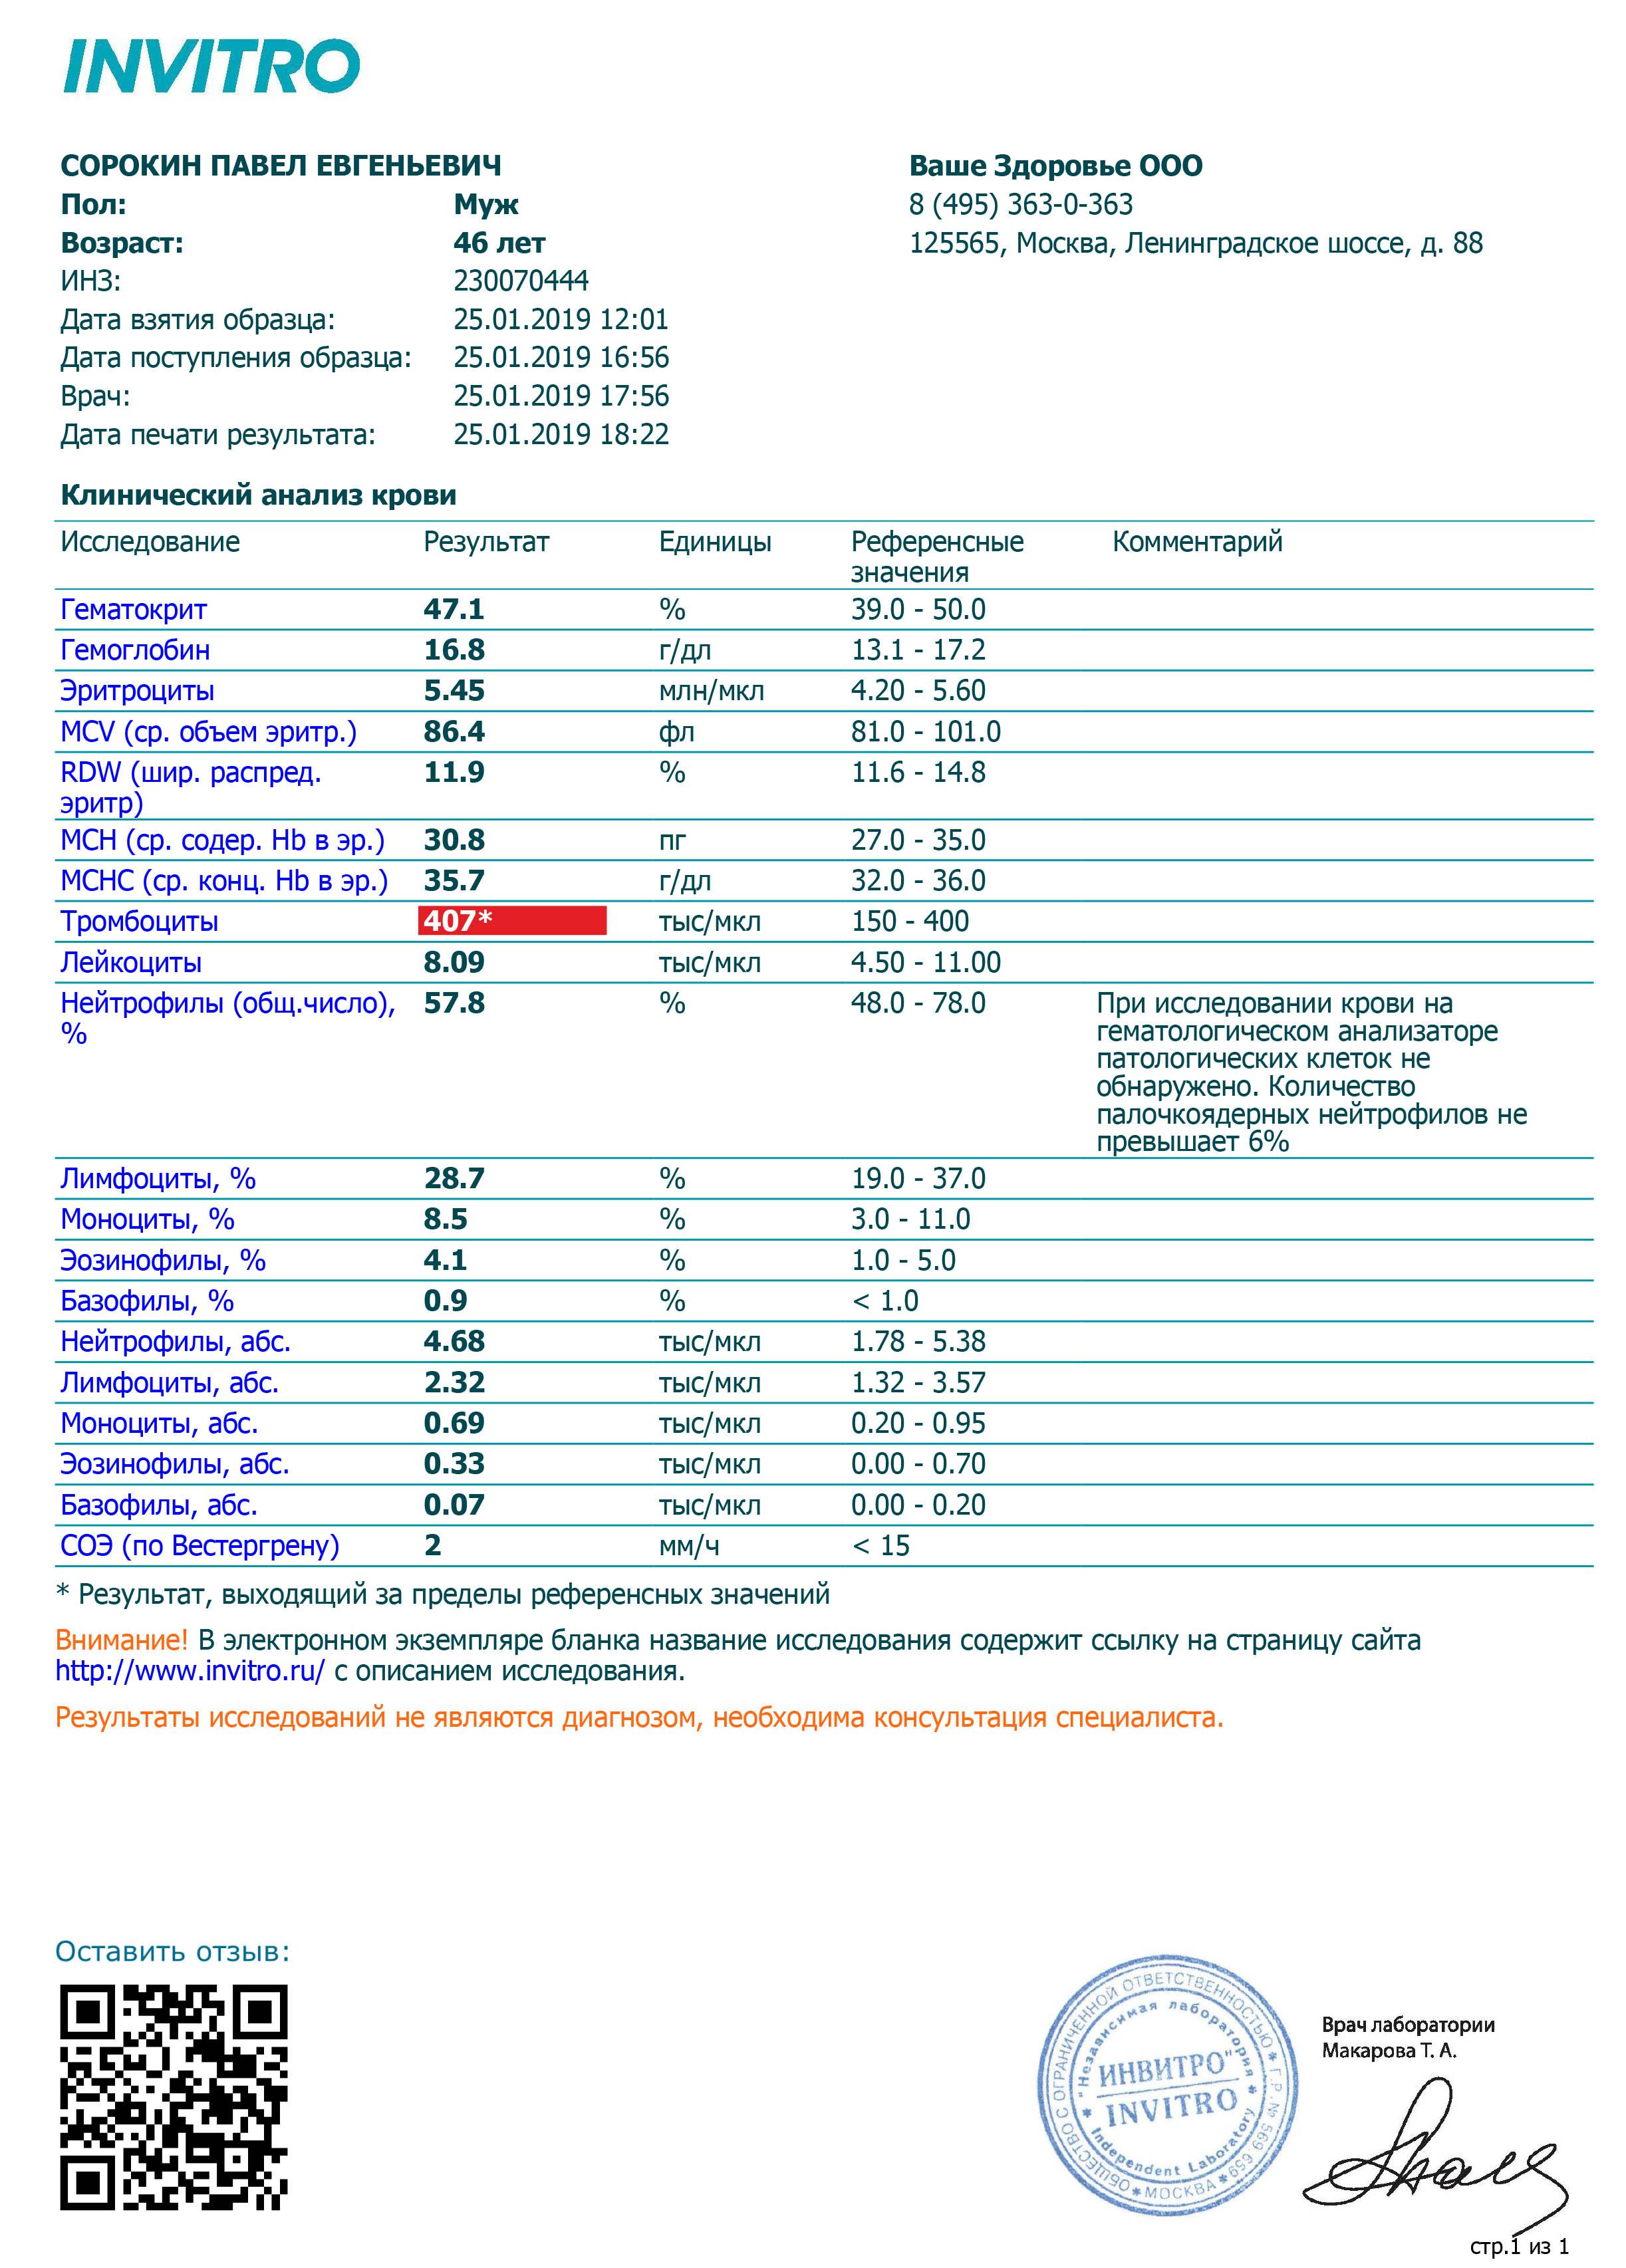 Инвитро биохимический показатели анализ крови wbc gra повышен крови и анализ